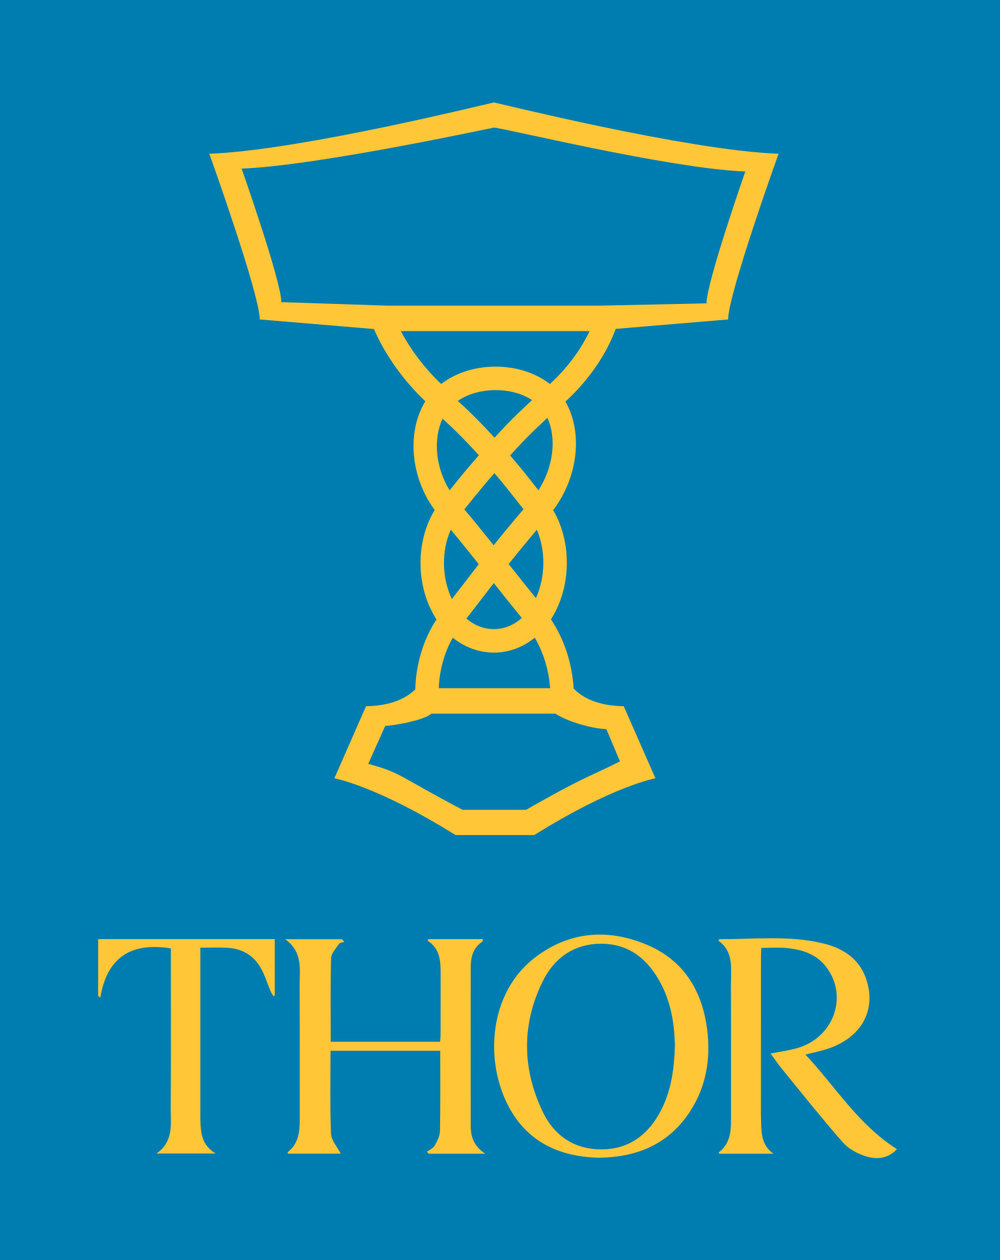 Thor_Logo_Vertical_500.jpg